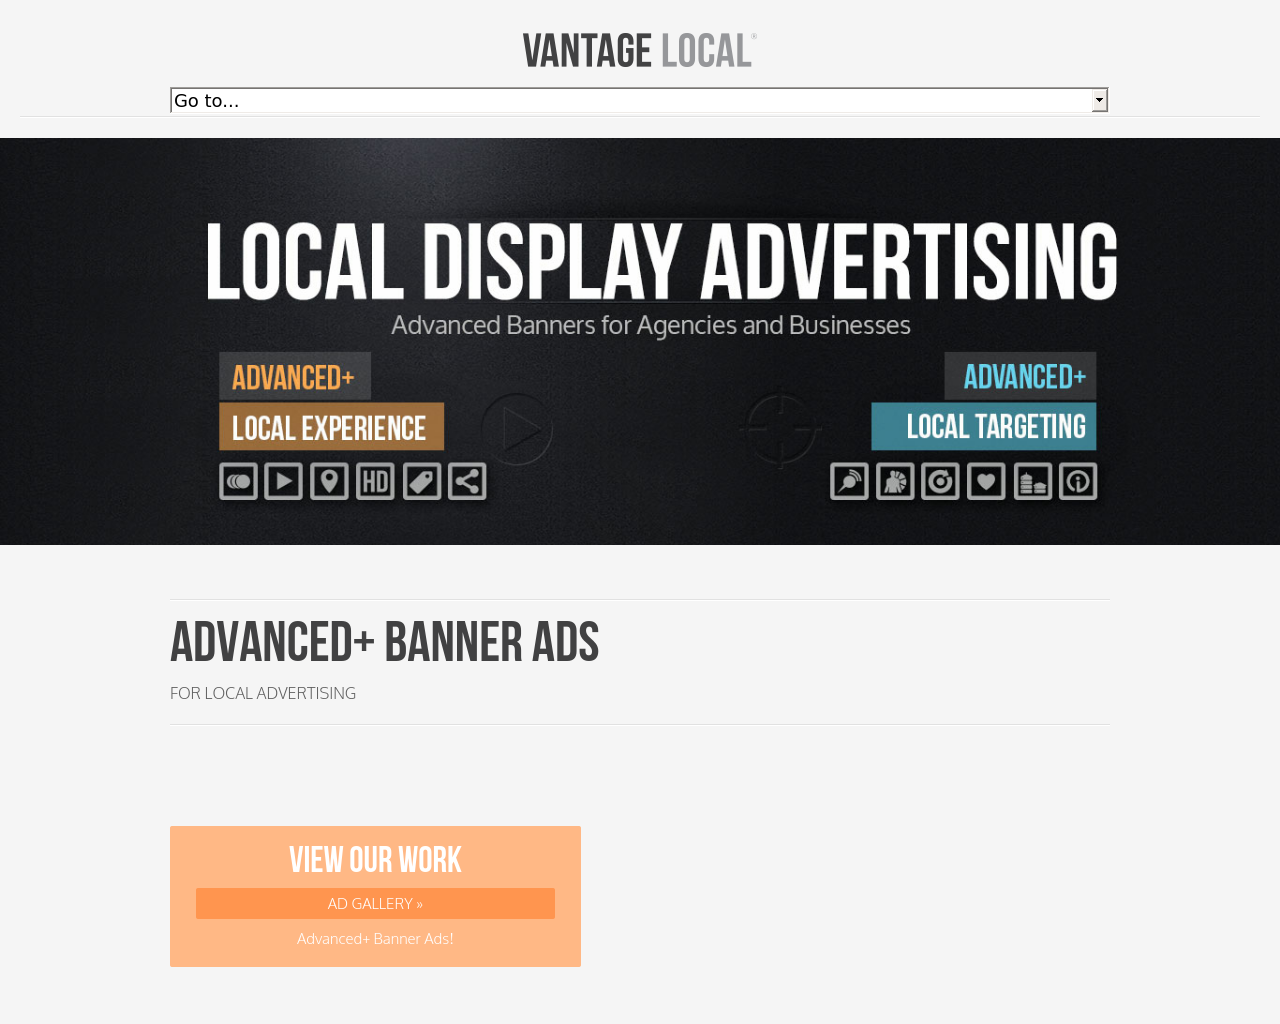 Vantage-Local-Advertising-Reviews-Pricing